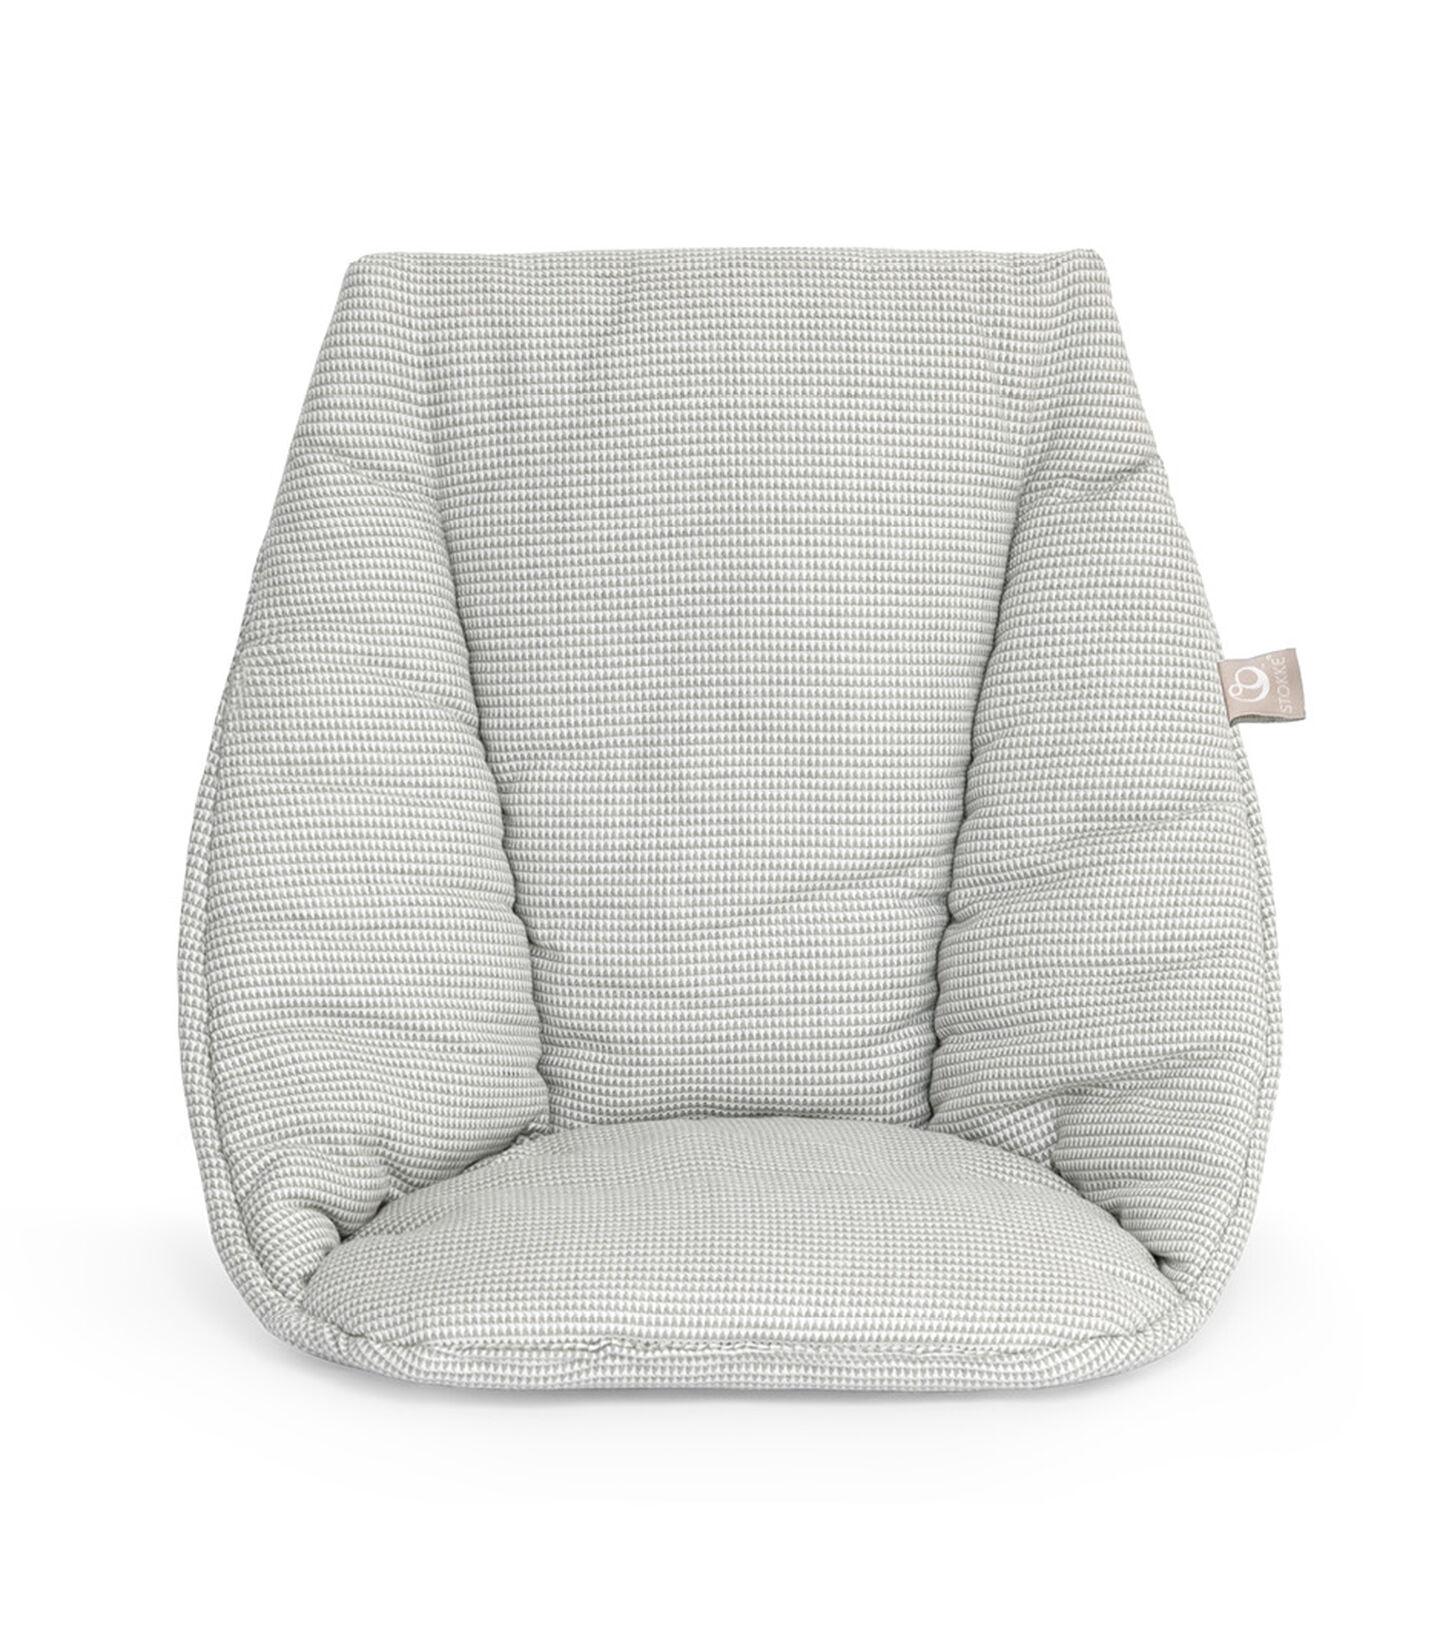 Tripp Trapp® Baby Kussen Nordic Grey, Nordic Grey, mainview view 1